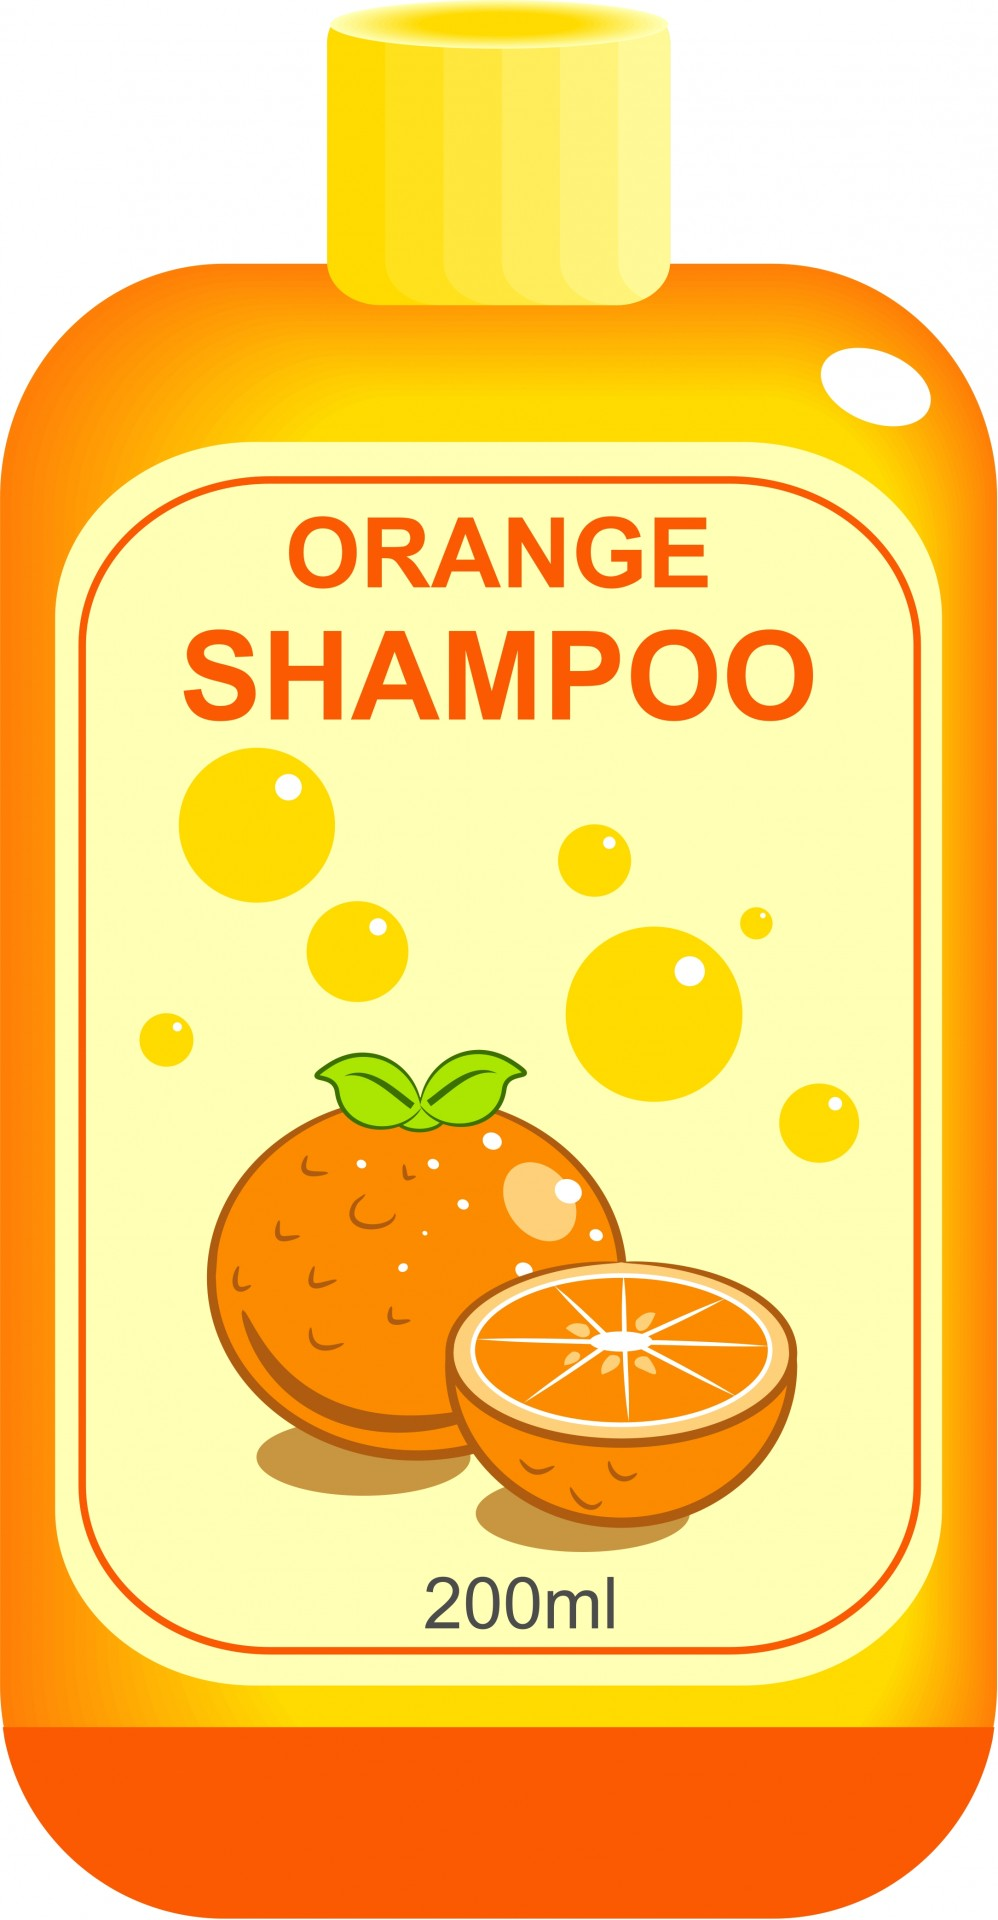 Shampoo clipart. Bottle of free stock